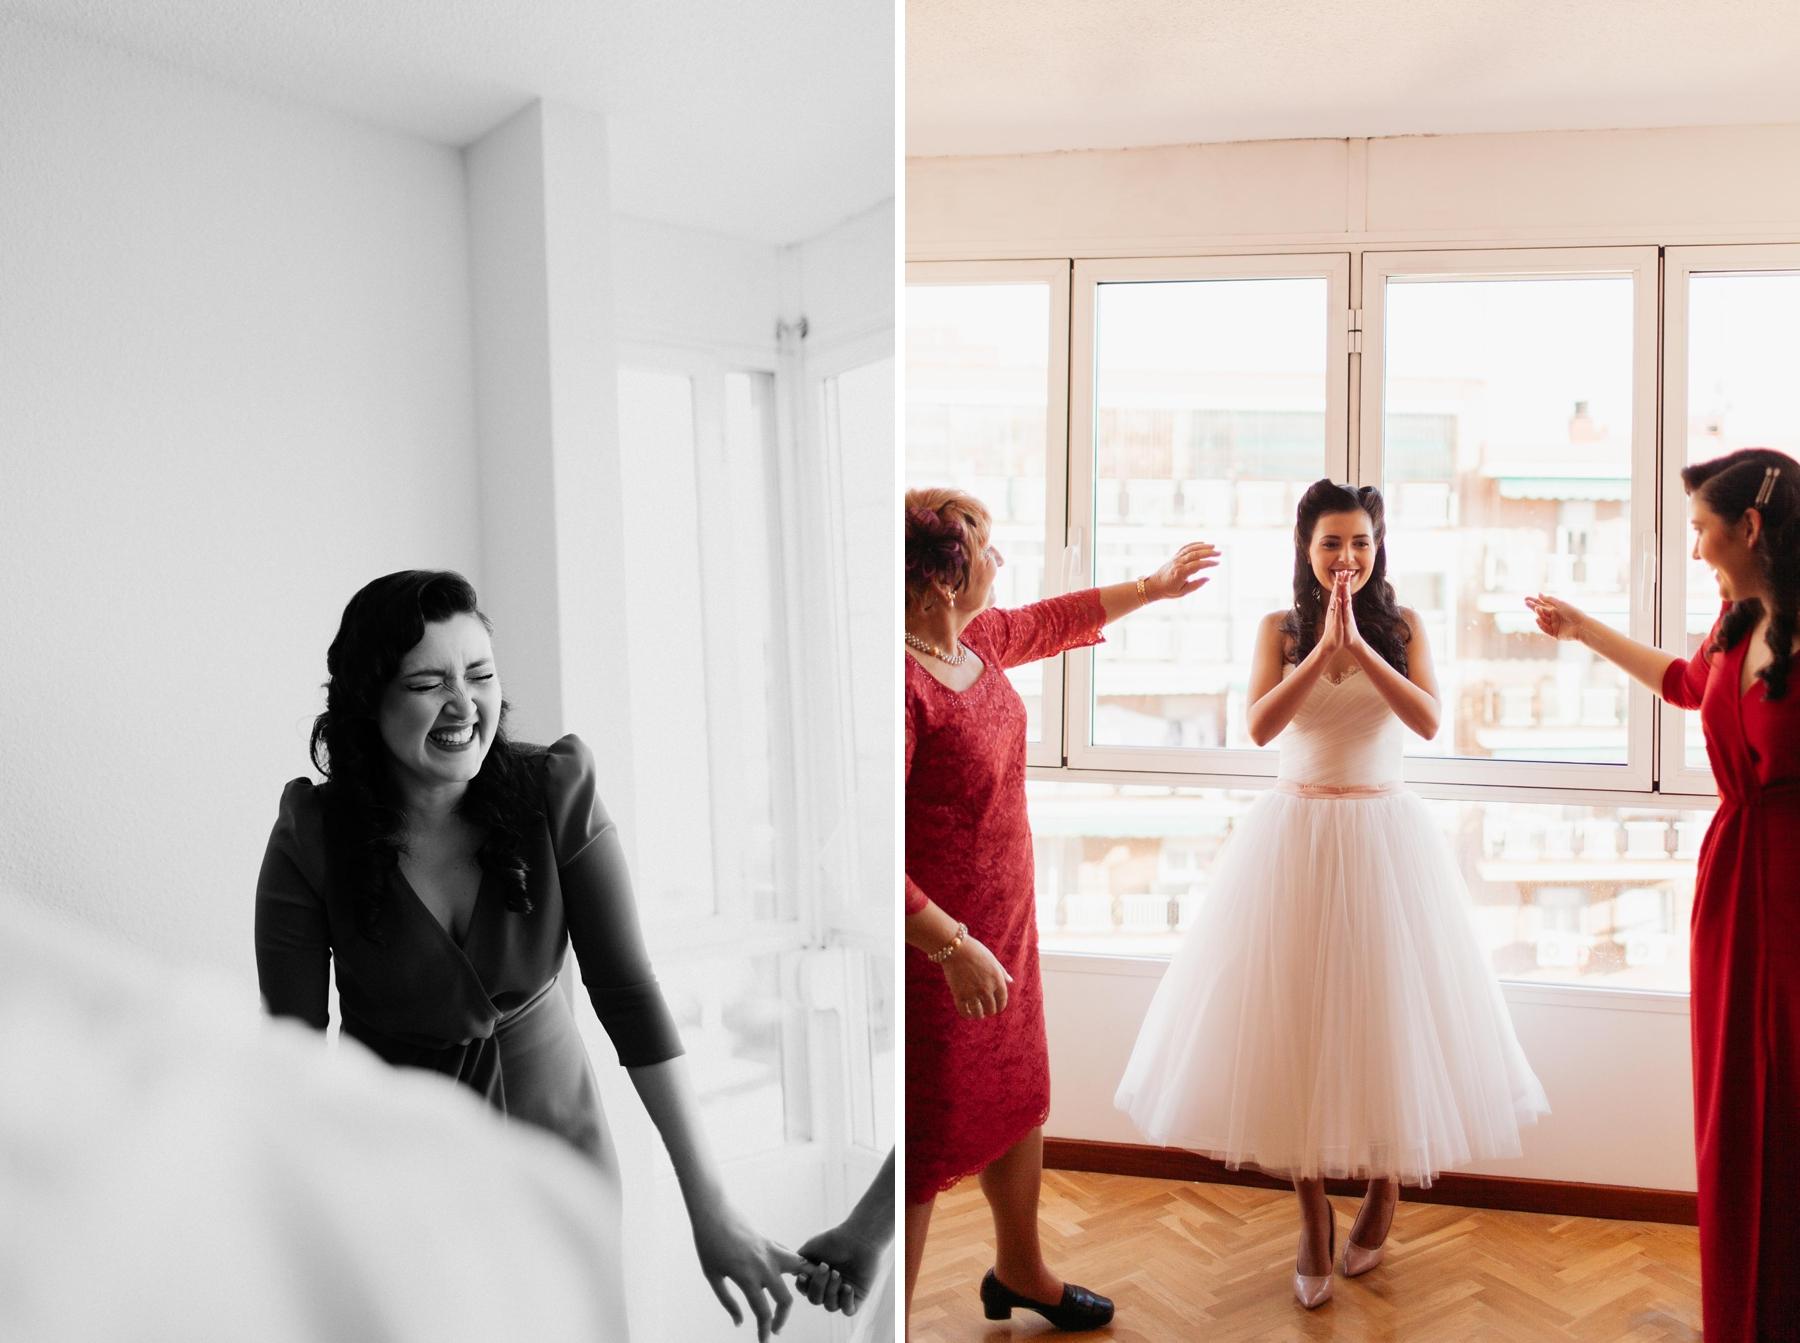 fotografo de bodas Jairo Crena-299